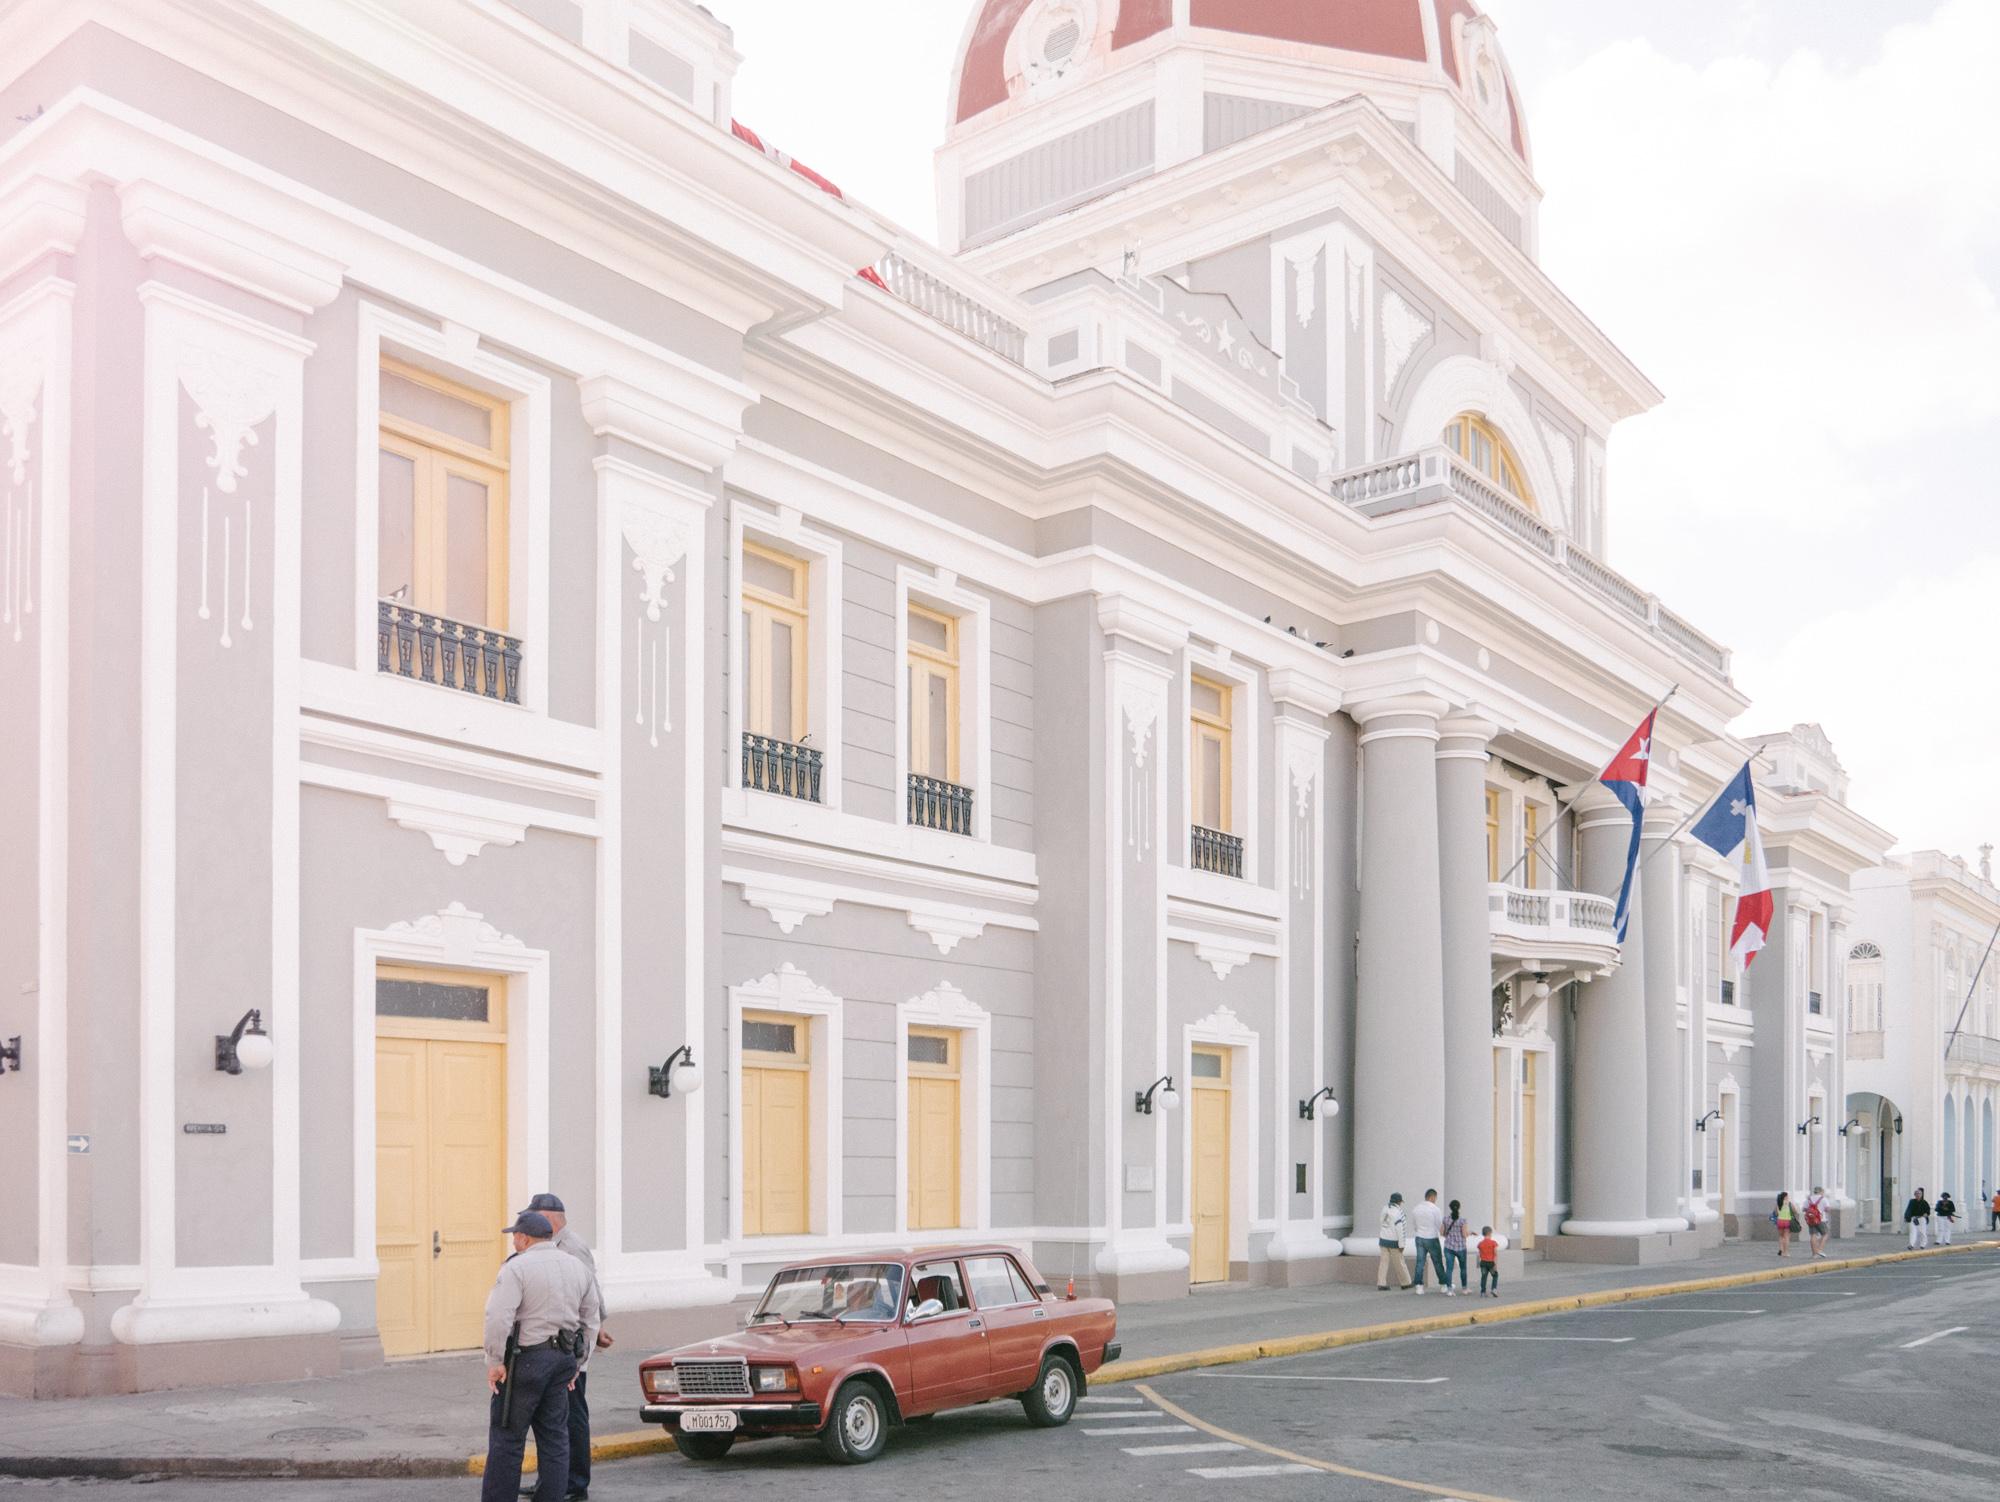 Museo Provincial at Jose Marti